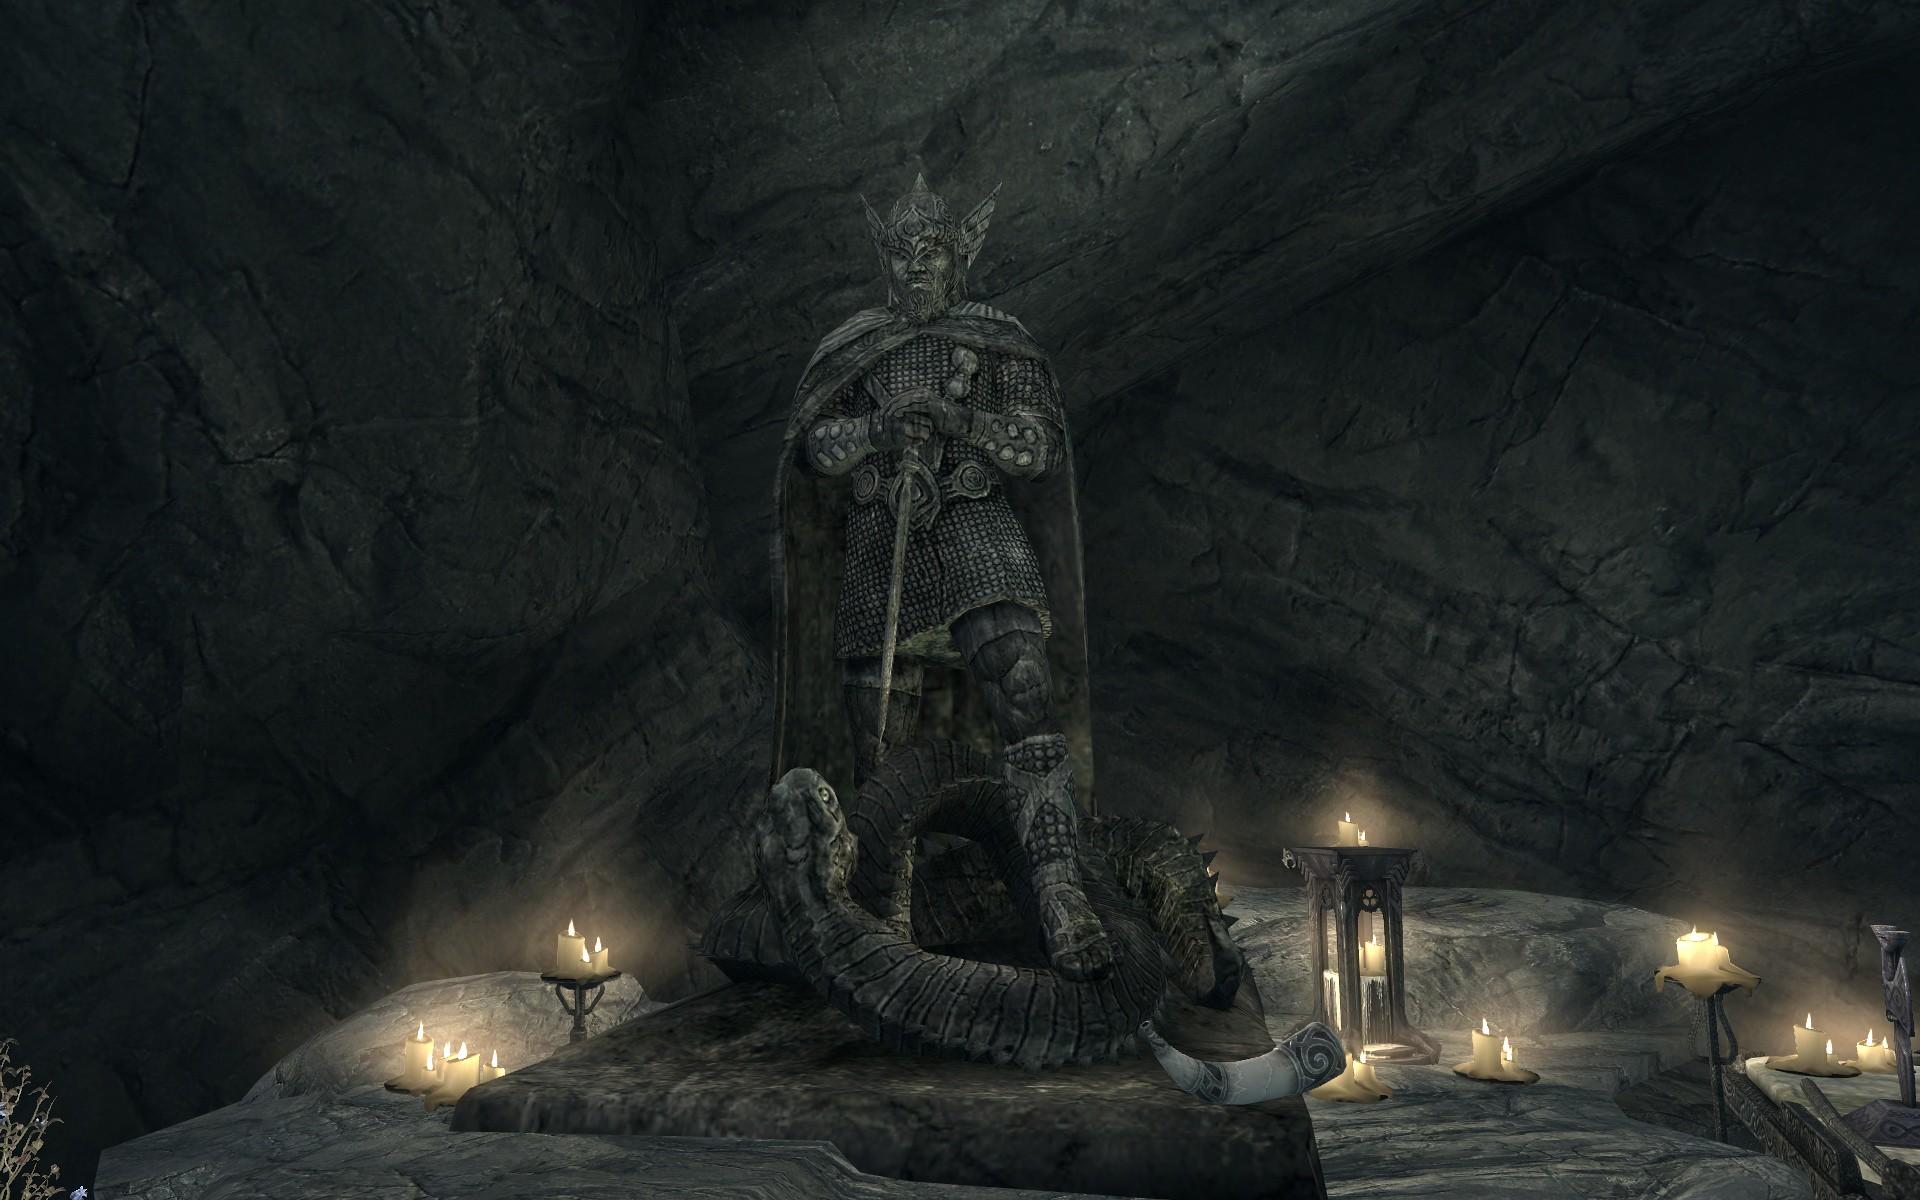 14380243118_ce806fe8c3_k.jpg - The Elder Scrolls 5: Skyrim